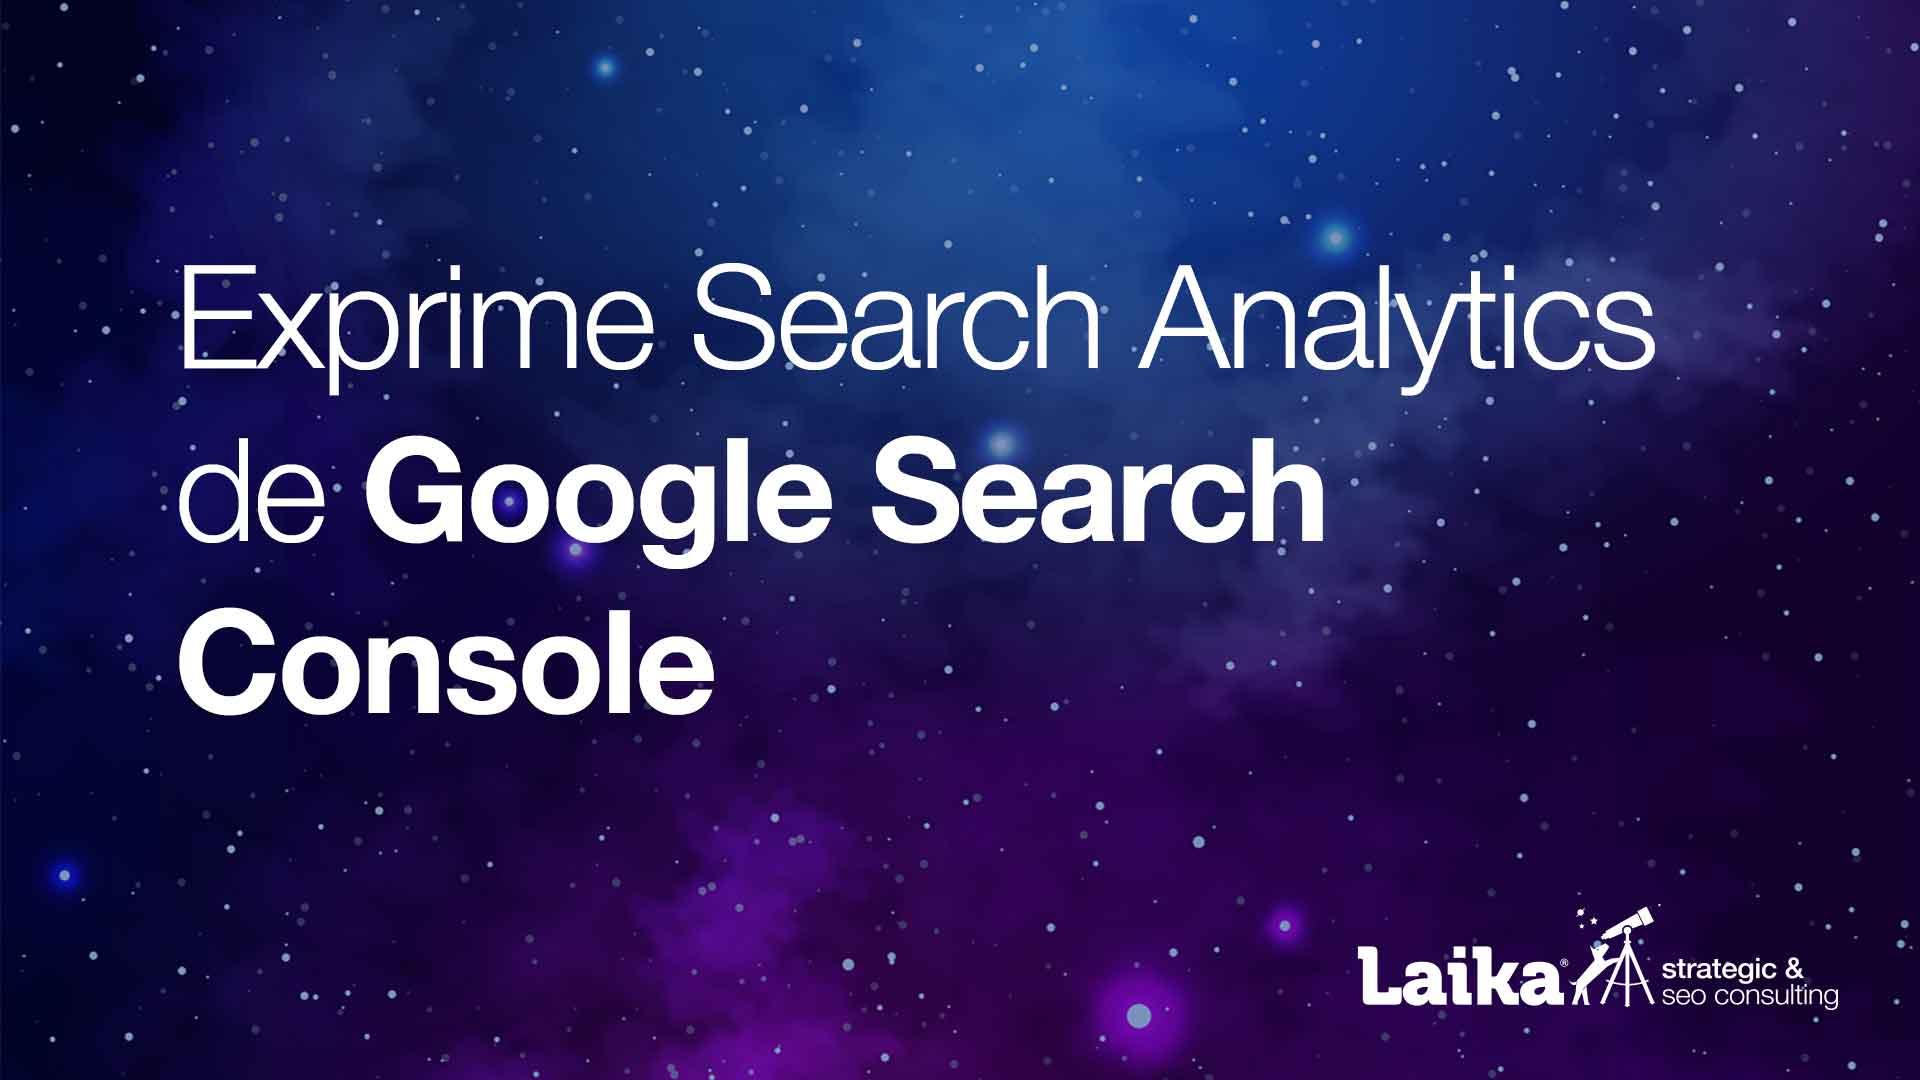 Exprime Search Analytics de Google Search Console